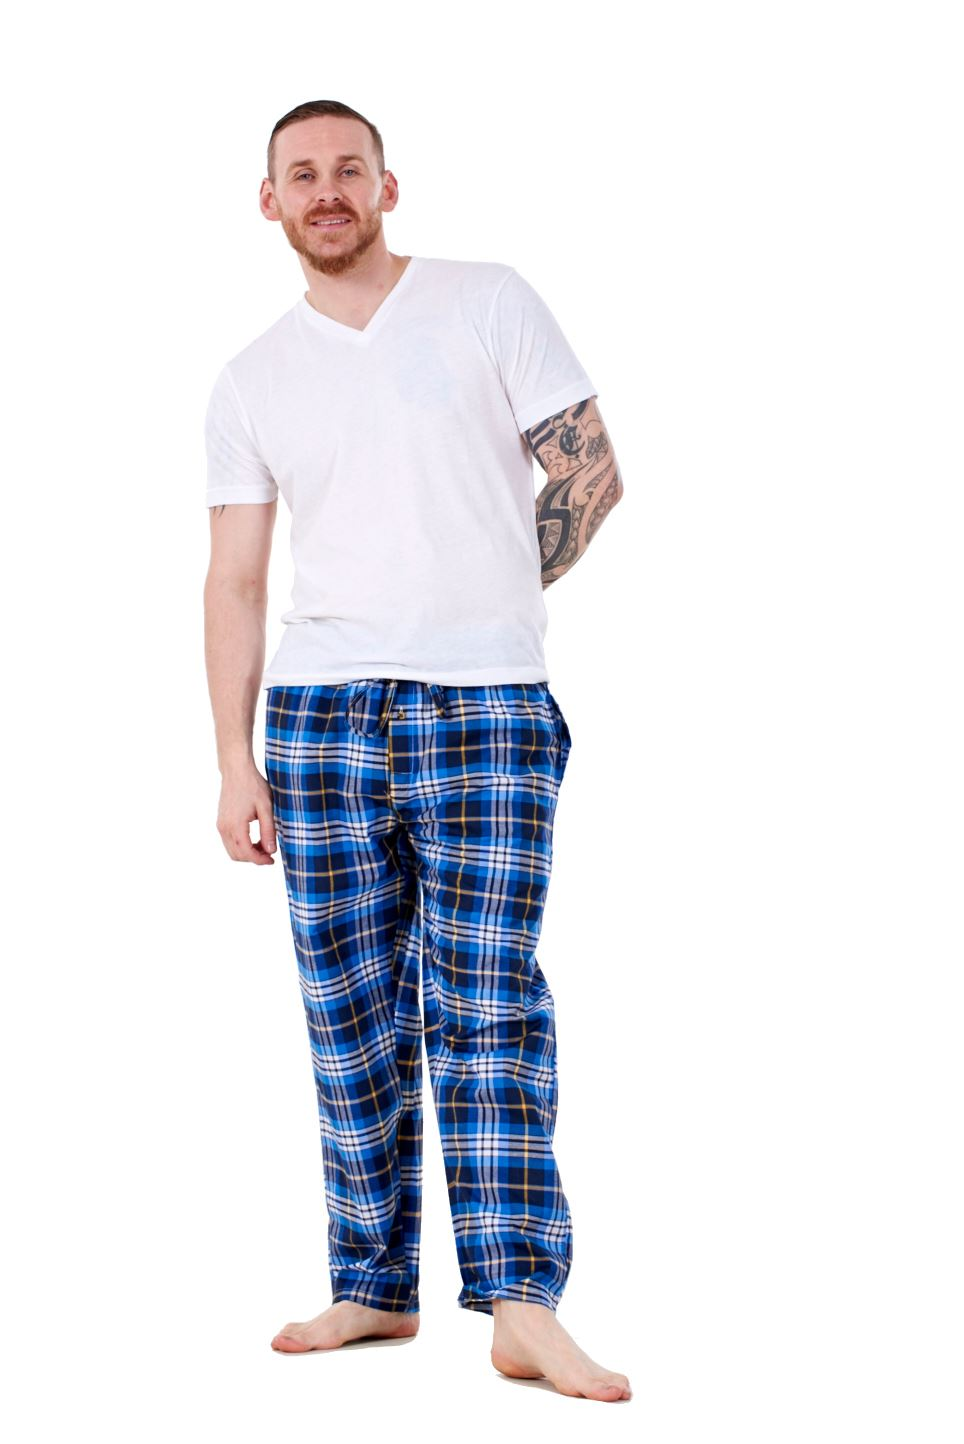 Mens-Pyjama-Bottoms-Rich-Cotton-Woven-Check-Lounge-Pant-Nightwear-Big-3XL-to-5XL Indexbild 61